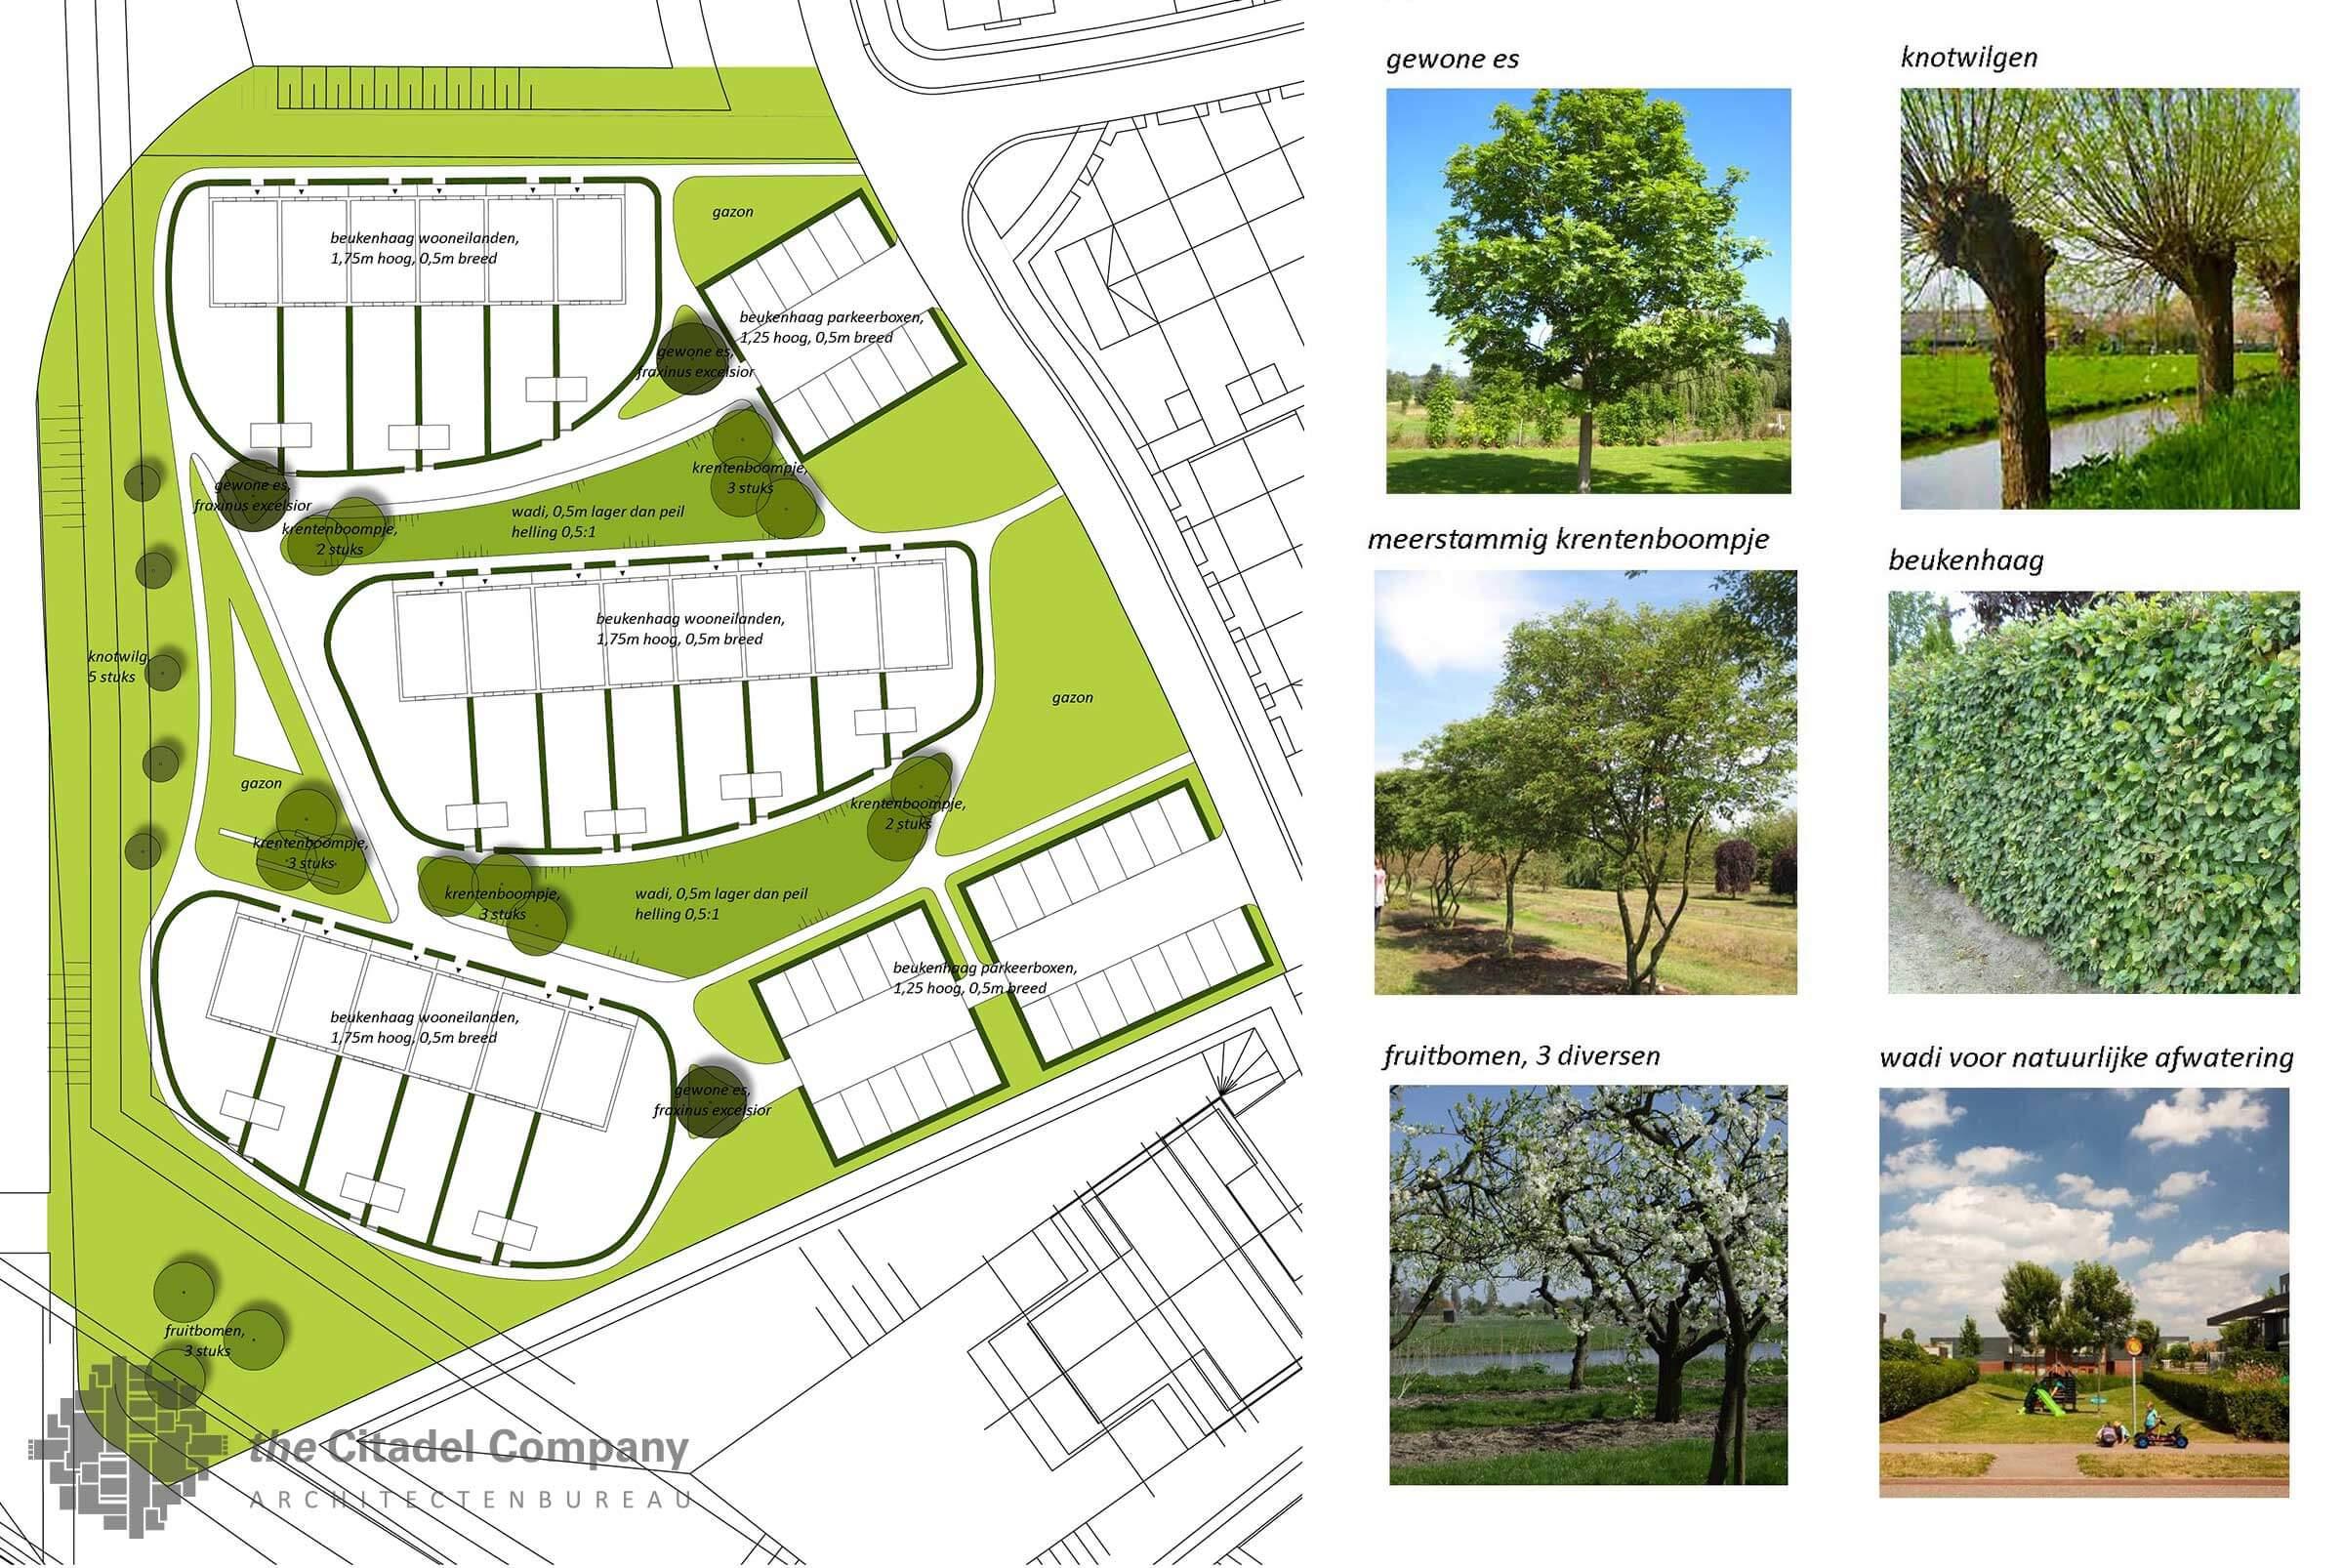 Stedenbouwkundig plan Vrij Werkeren Zwolle_Beplantingsplan